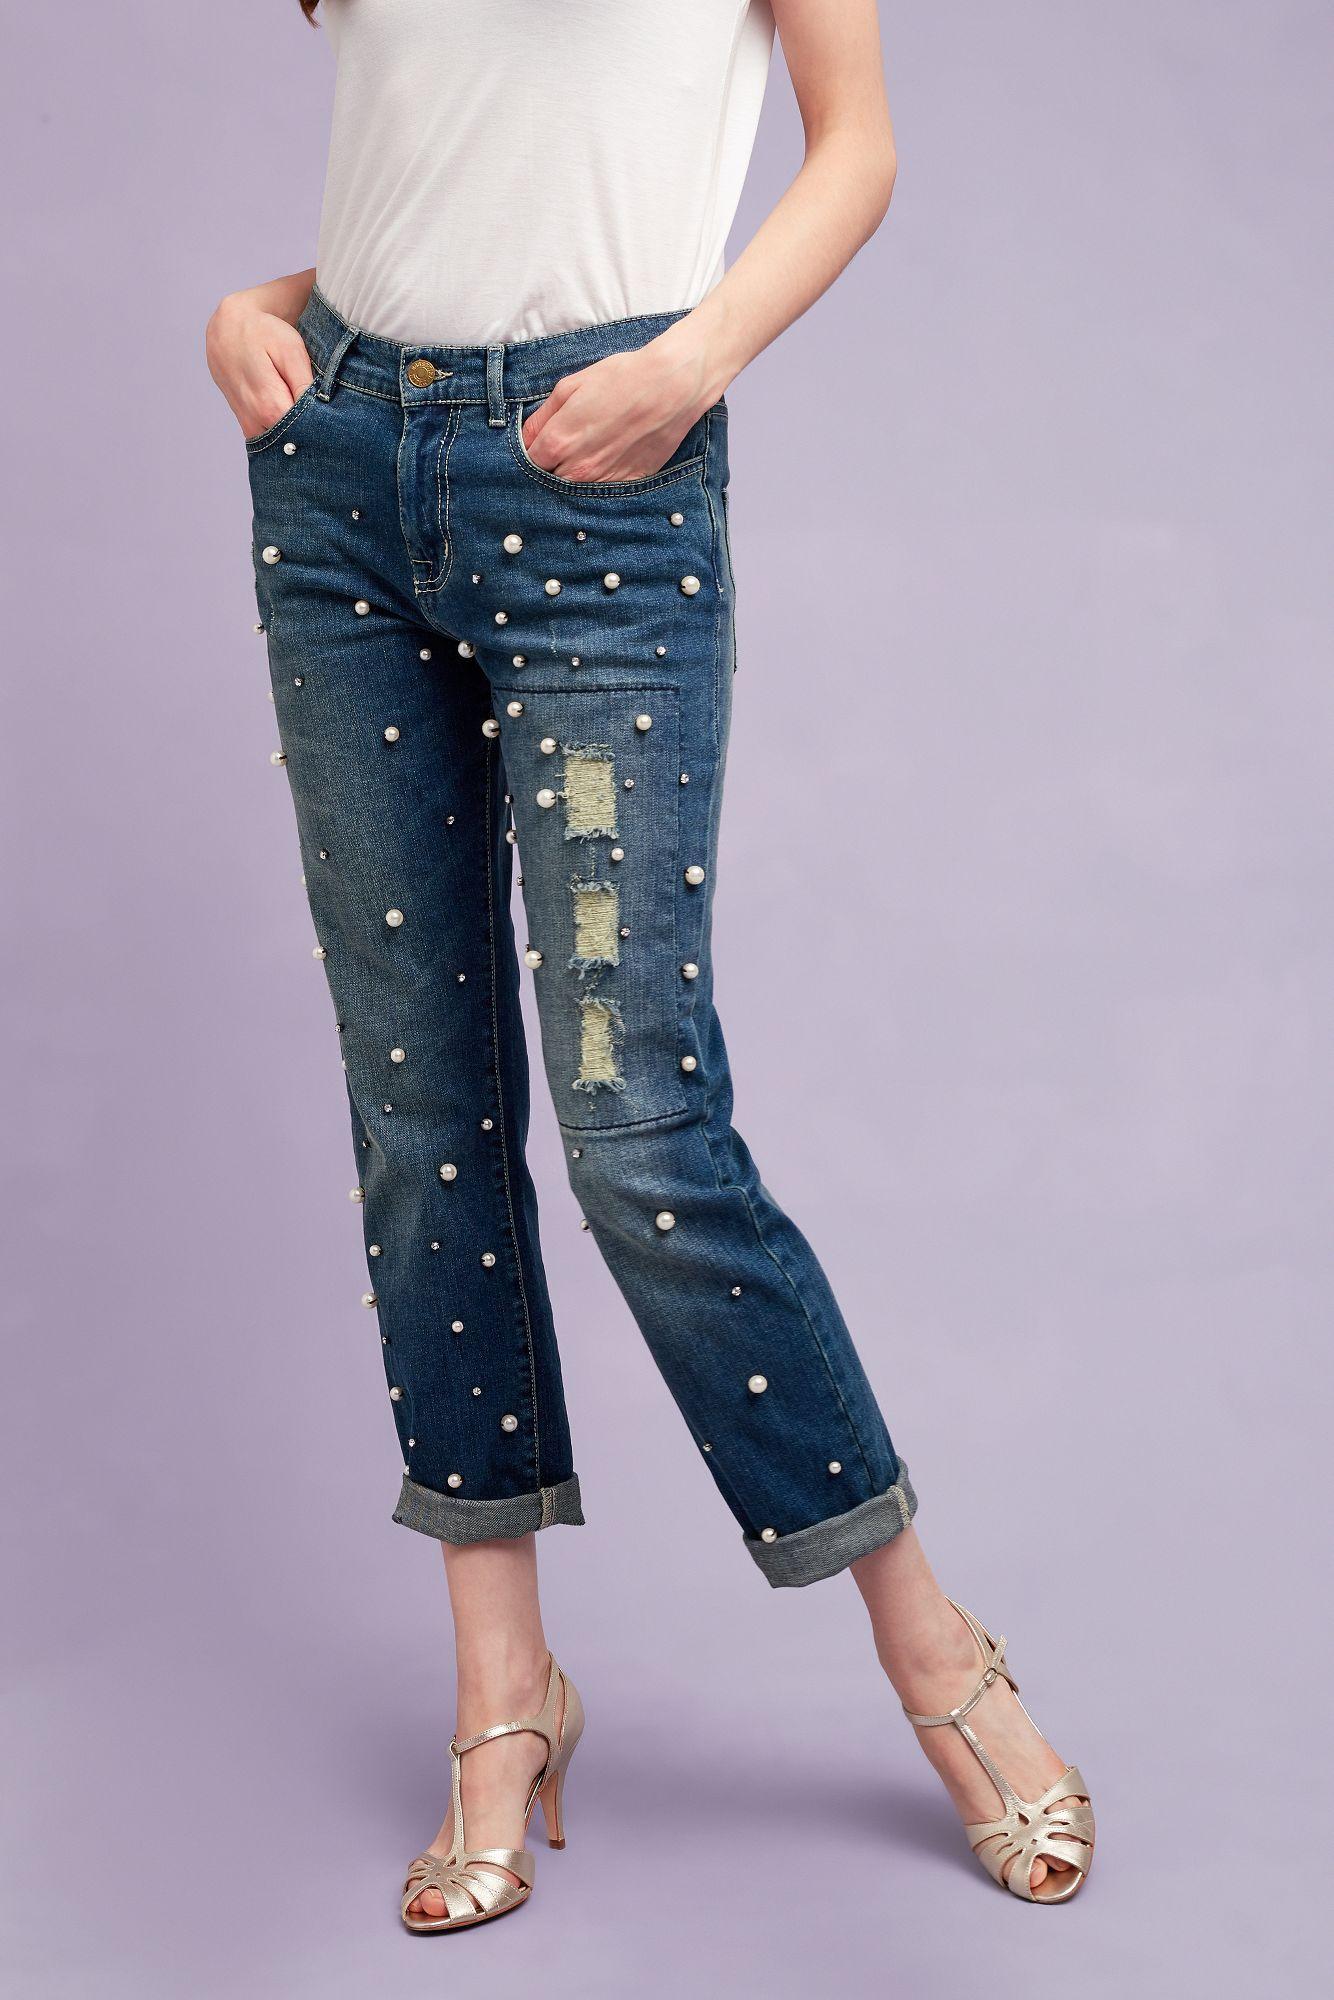 Essentiel Antwerp Denim Pearl-embellished Boyfriend Jeans in Blue